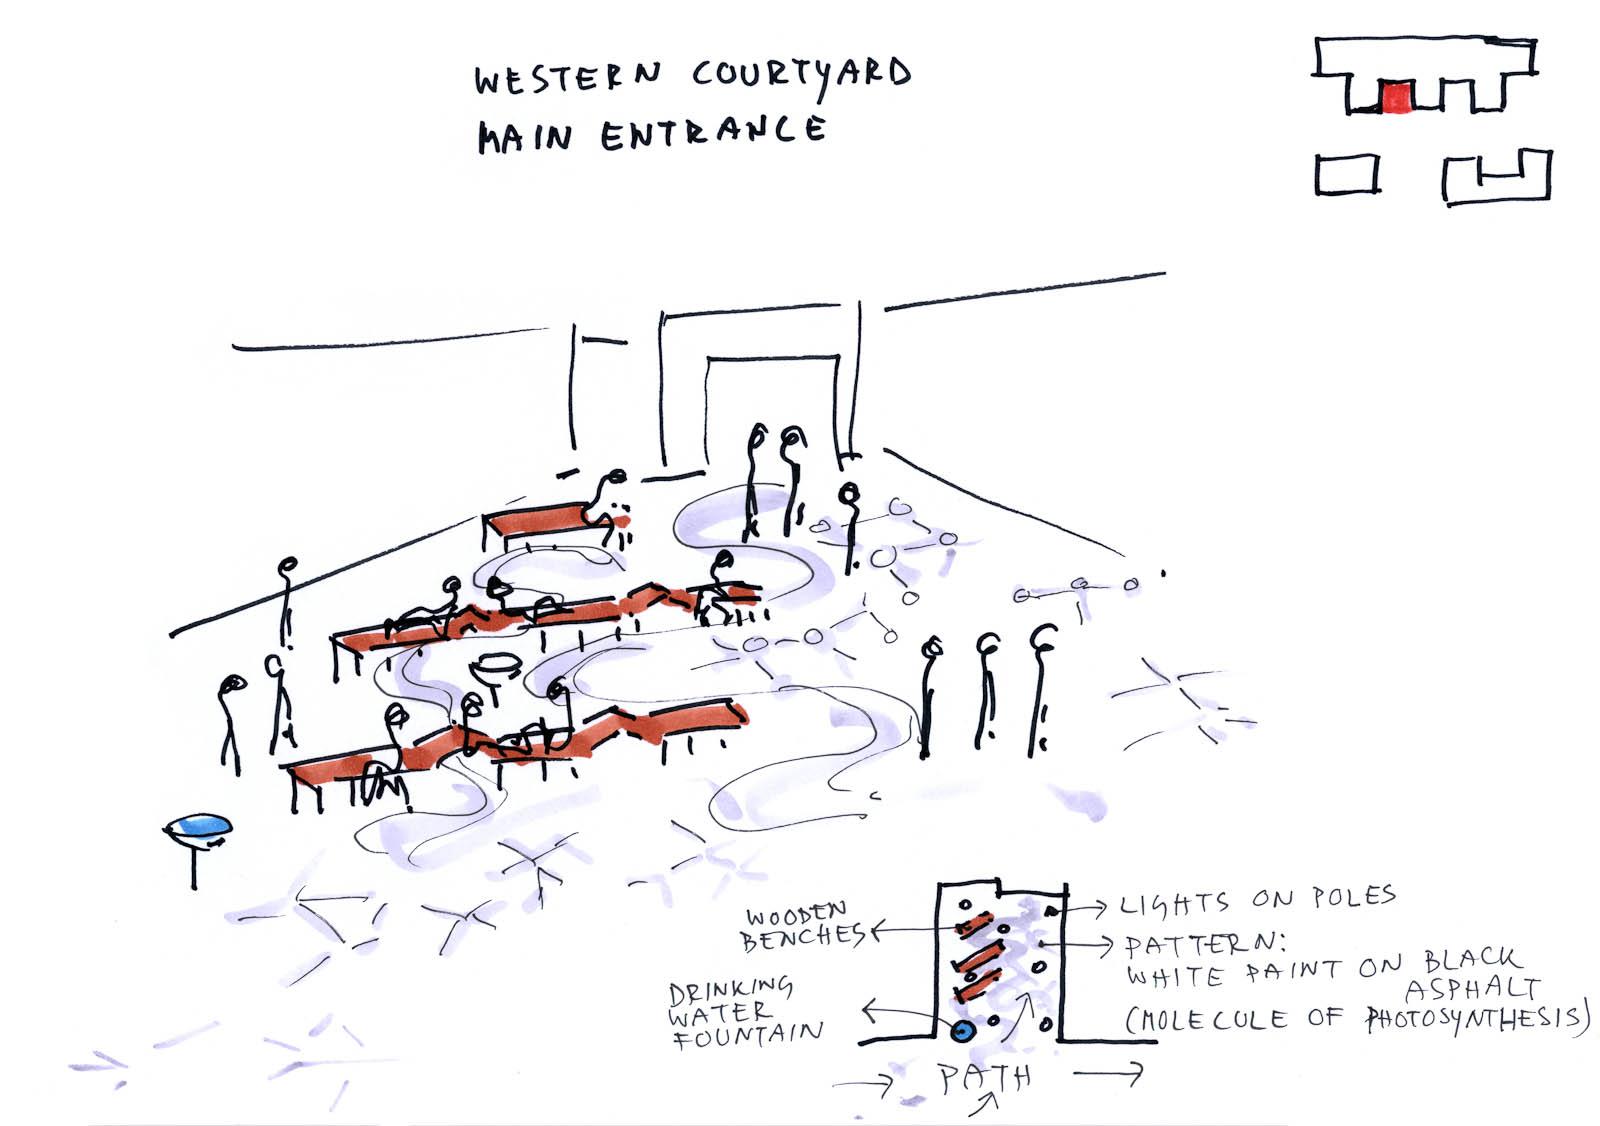 Skiss av ett klassrum. Marjetica Potrc och STEALTH, Fruit and Energy Farms in a Public Square.